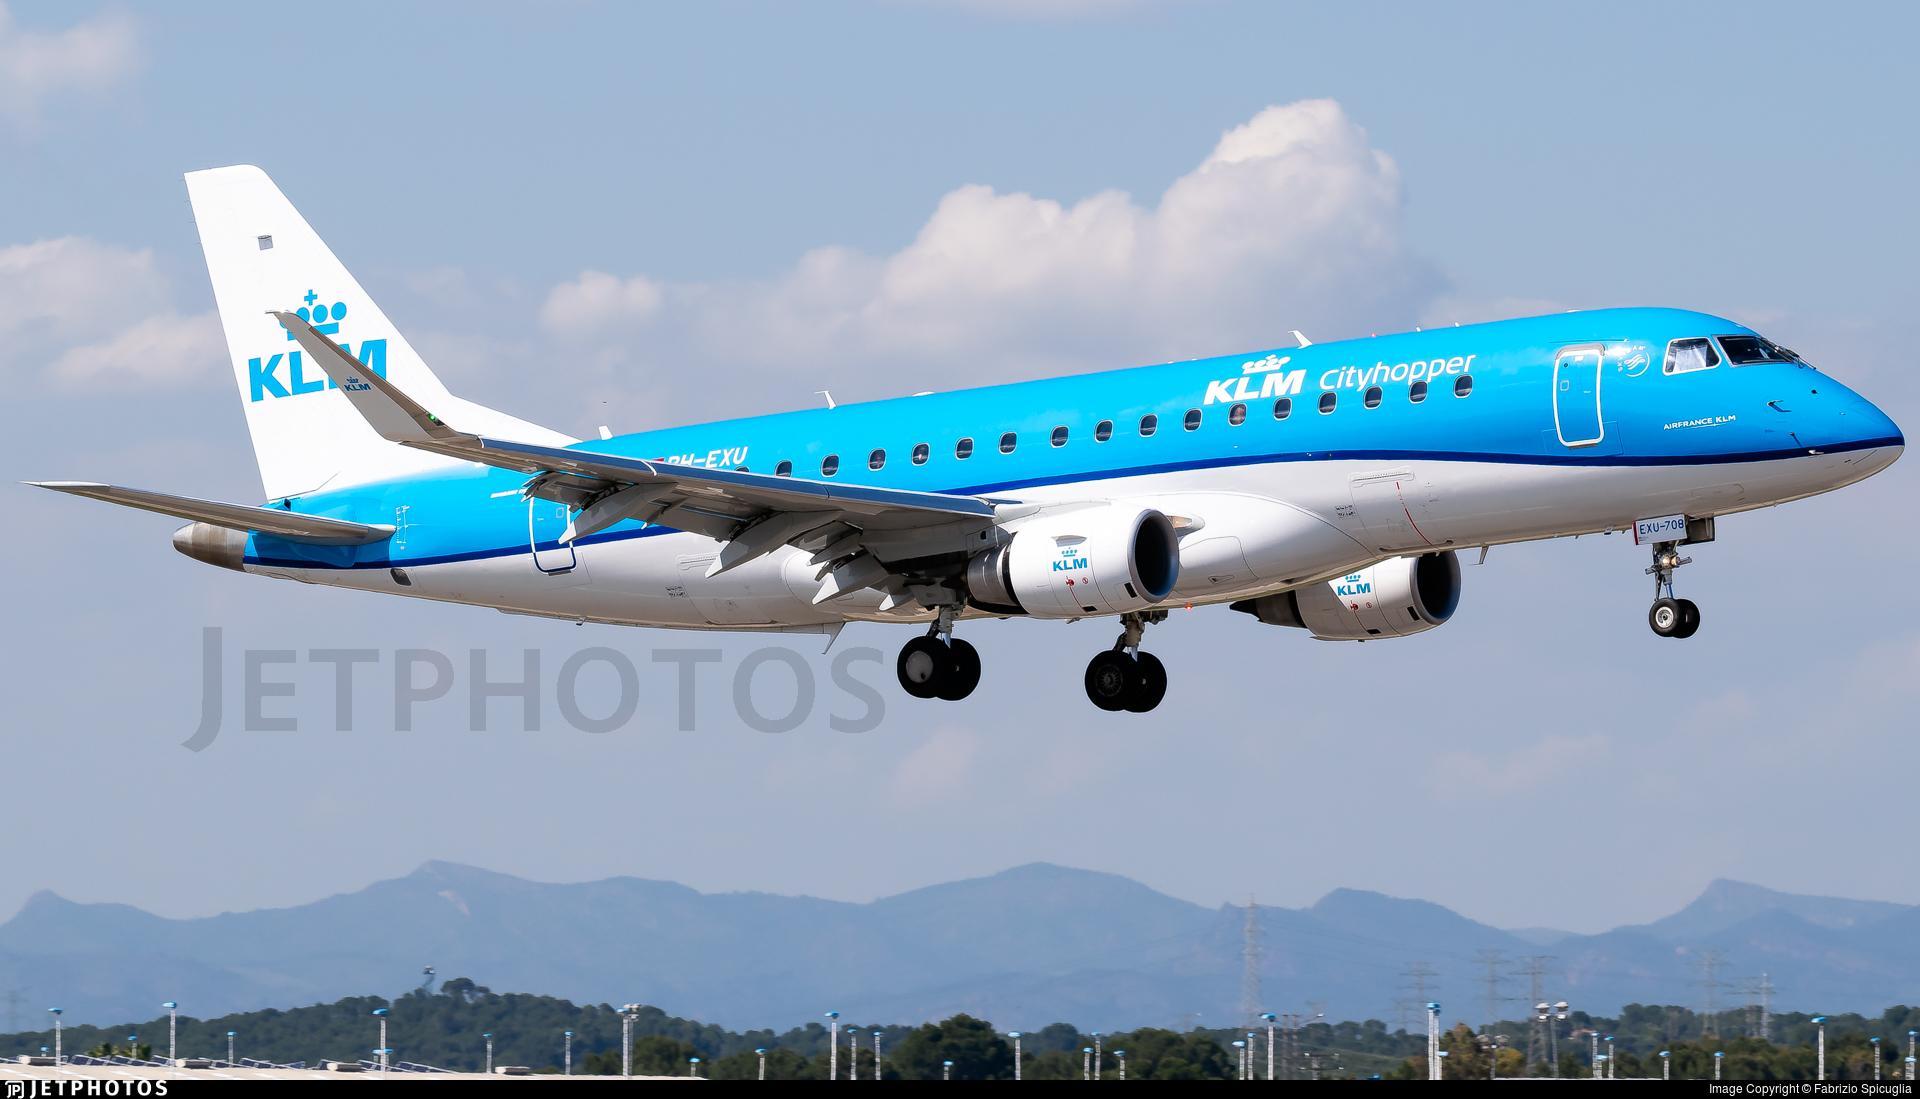 PH-EXU - Embraer 170-200STD - KLM Cityhopper